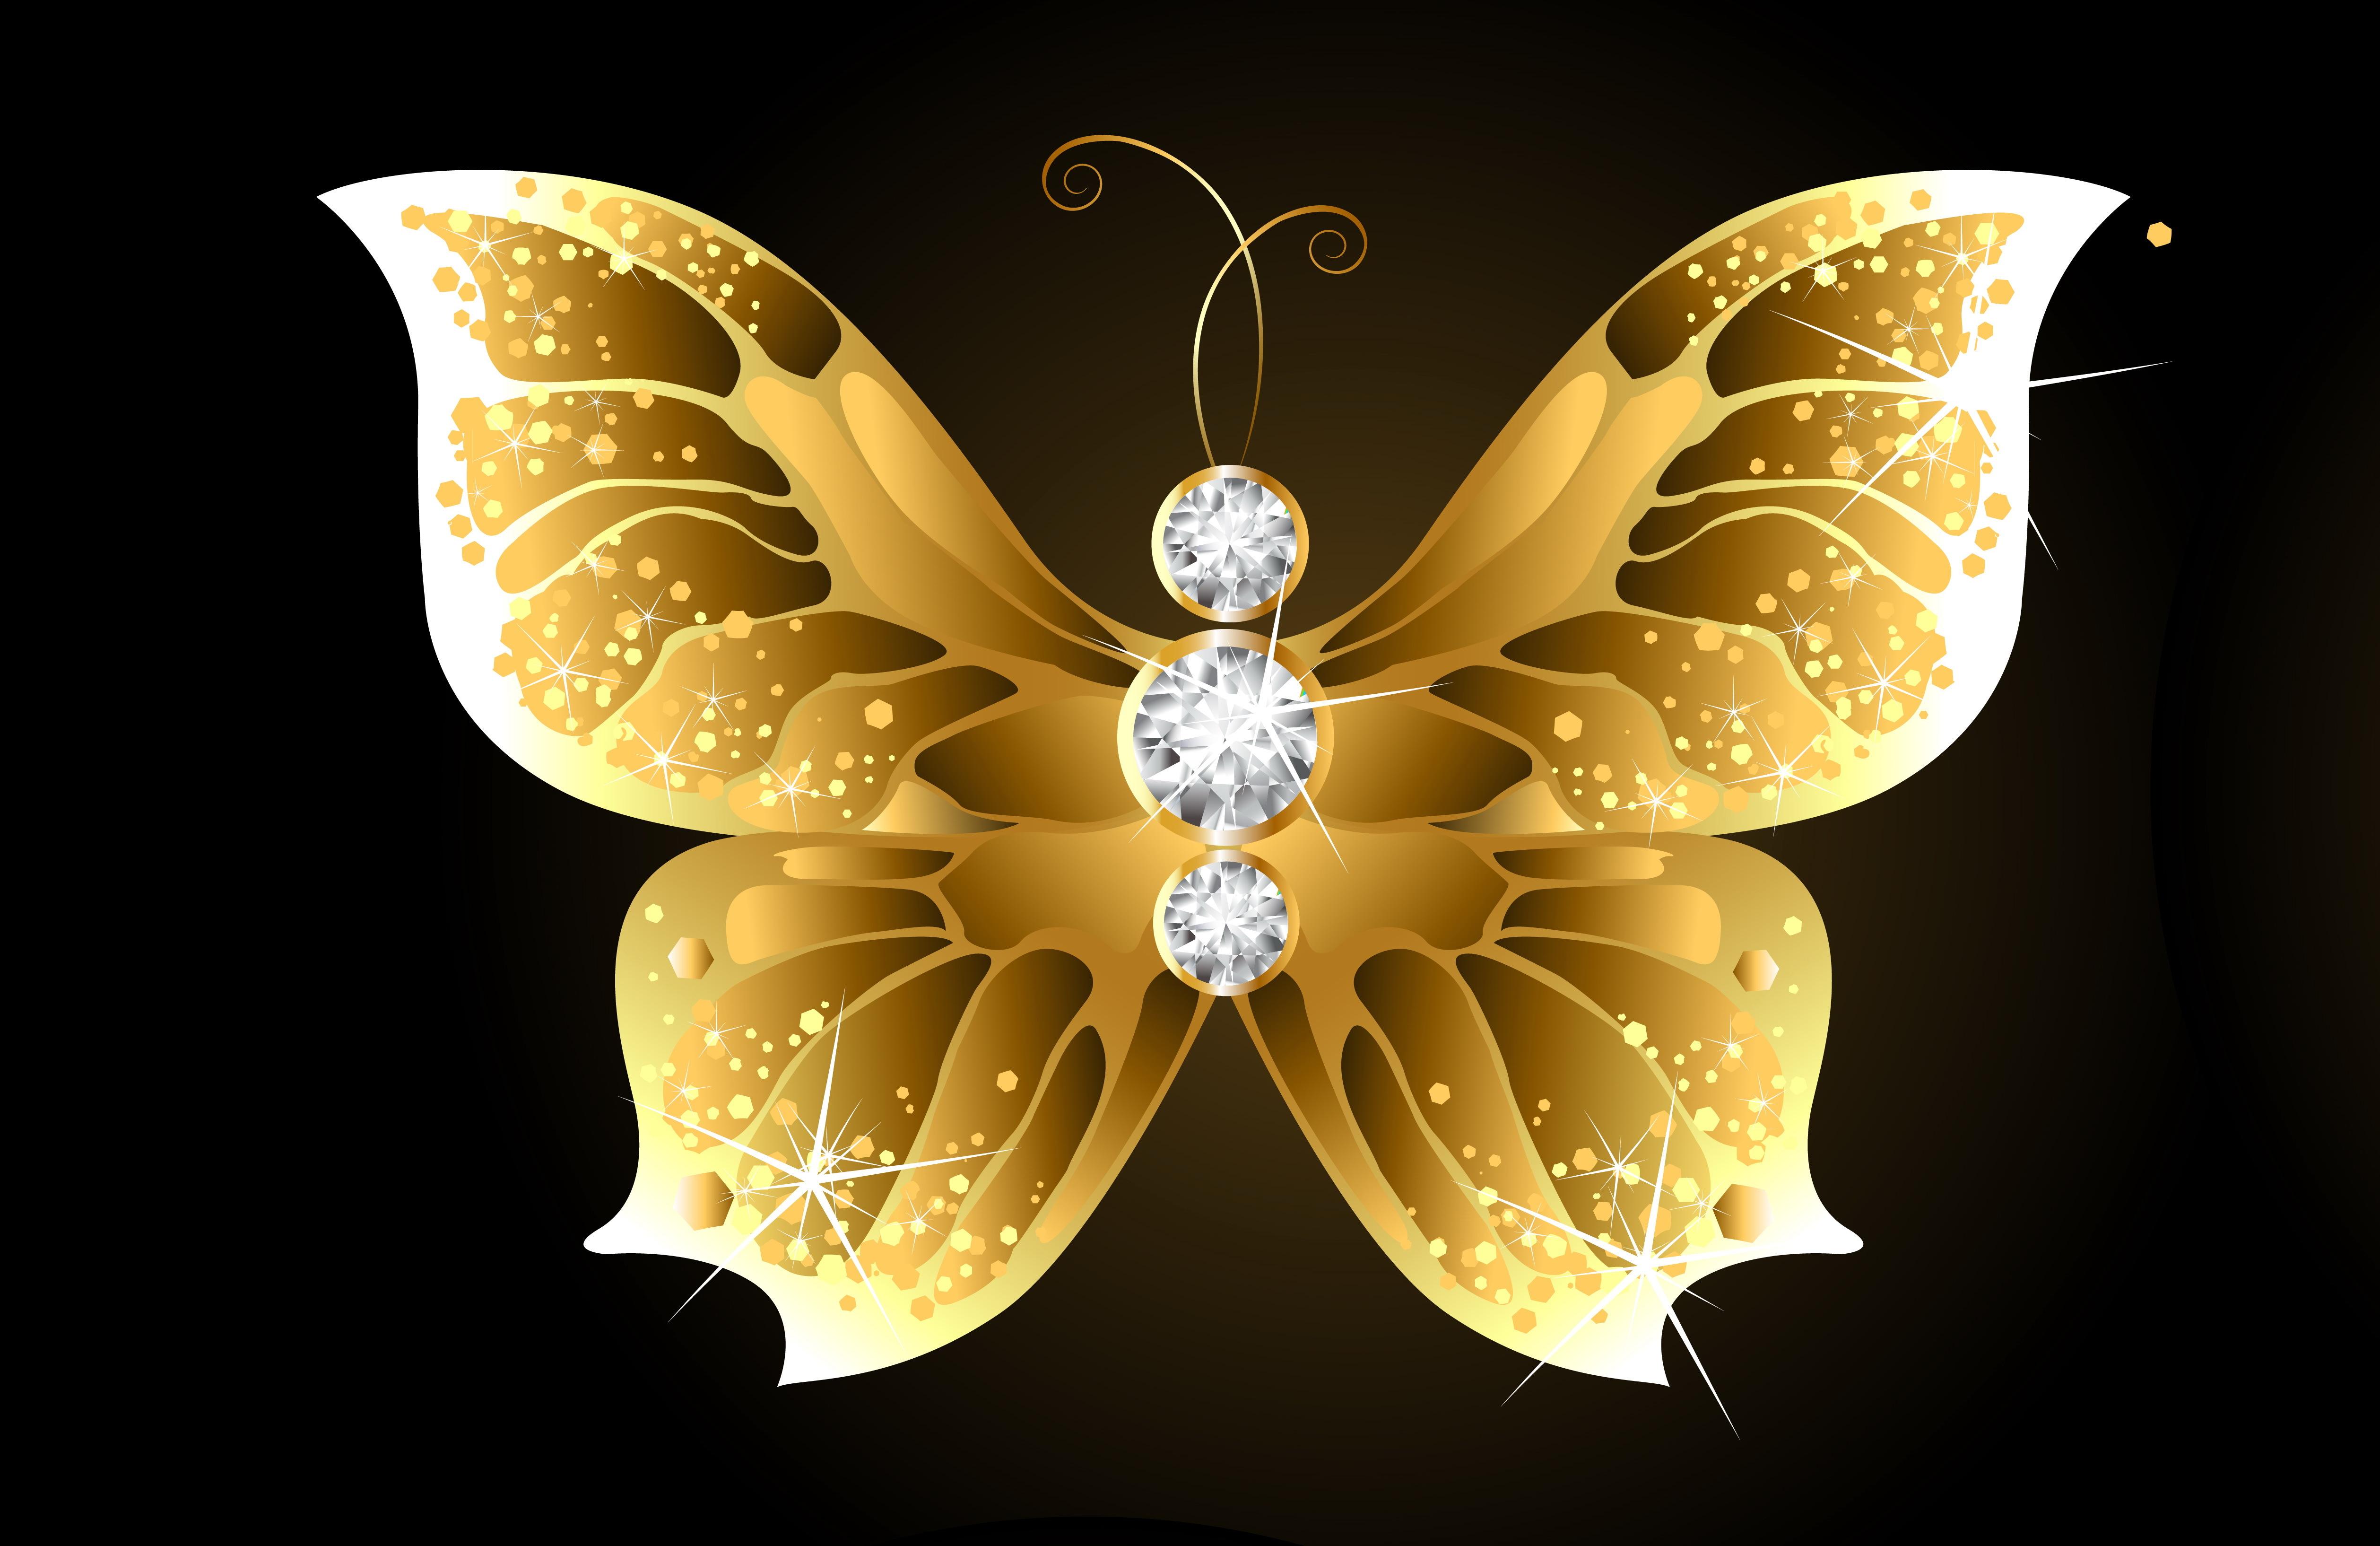 Golden Butterfly 4k Ultra HD Wallpaper | Background Image ...